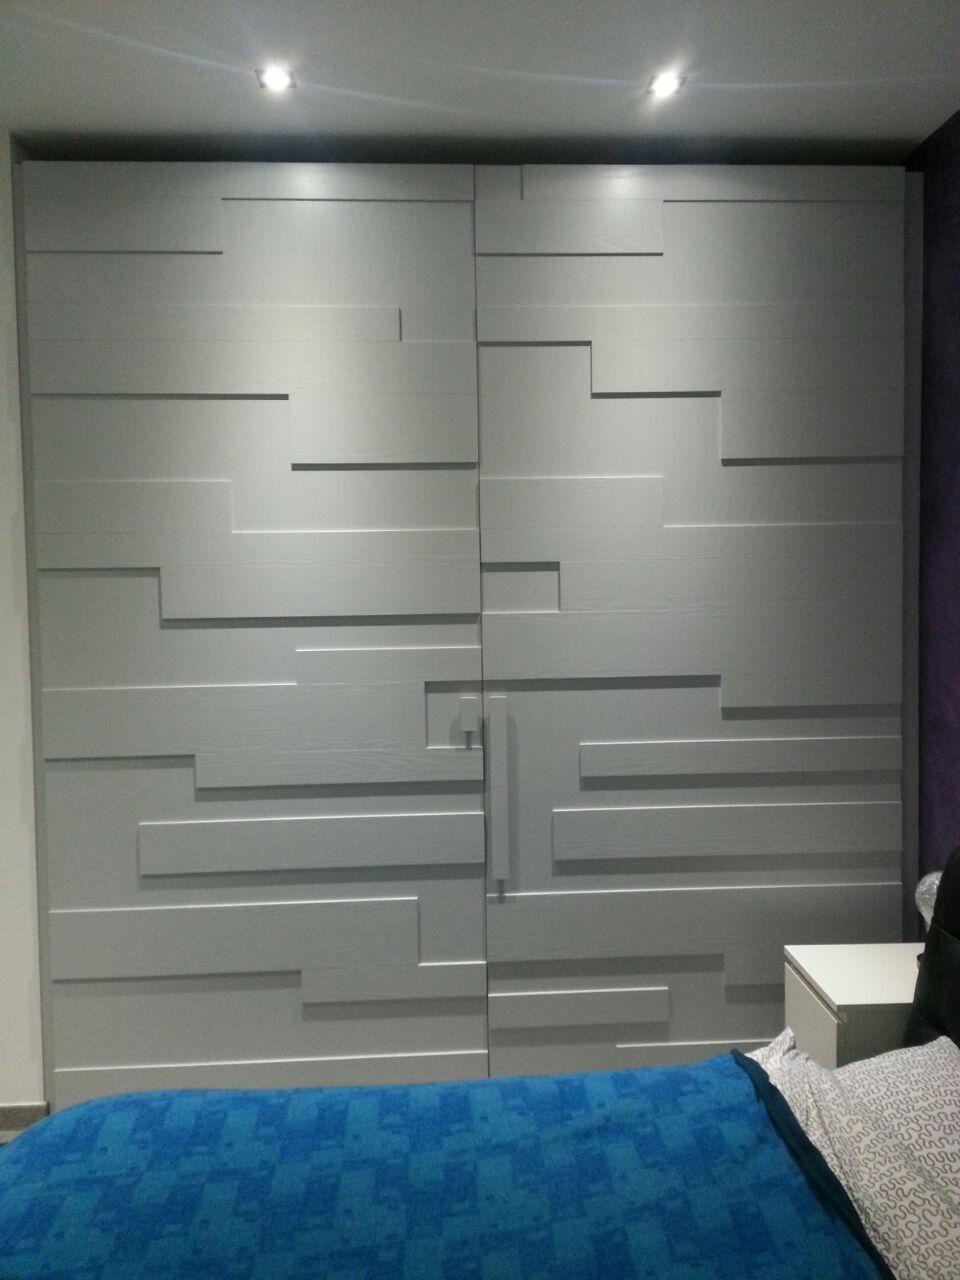 Cucina Su Misura Falegname falegnameria bensiarmadio su misura | wardrobe doors